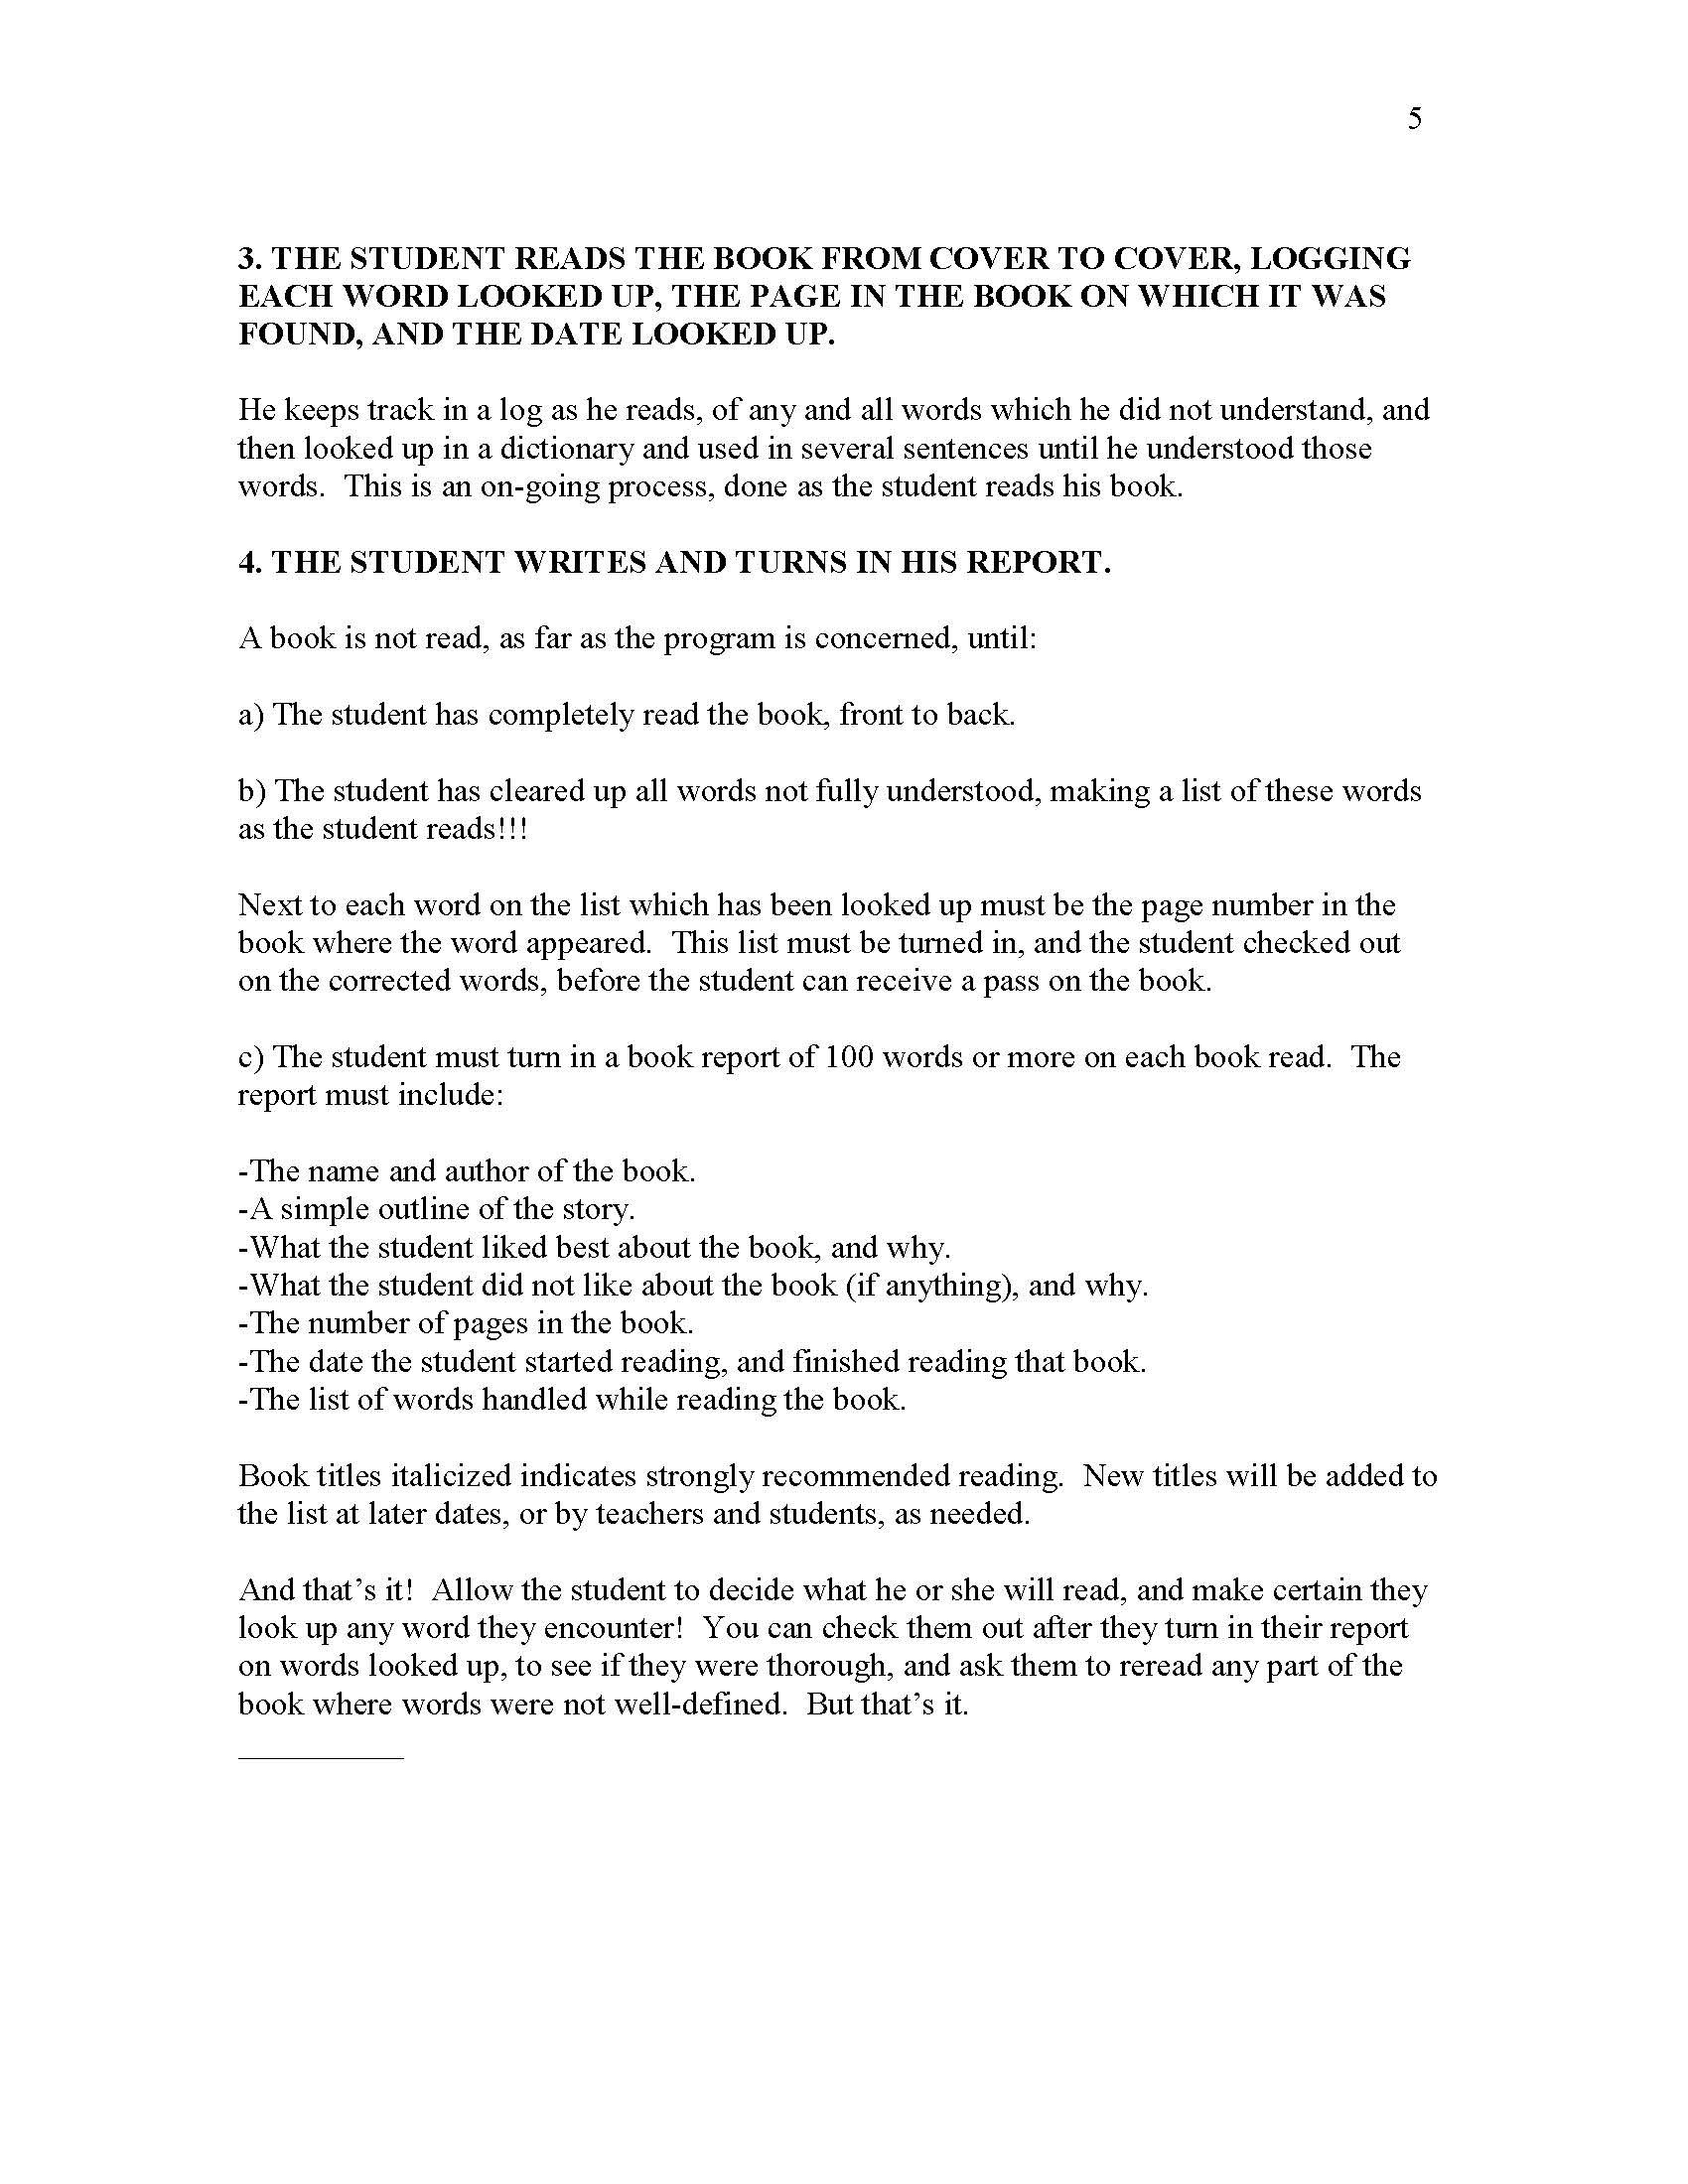 Samples STEP 3-4 Basic Reading Program_Page_06.jpg